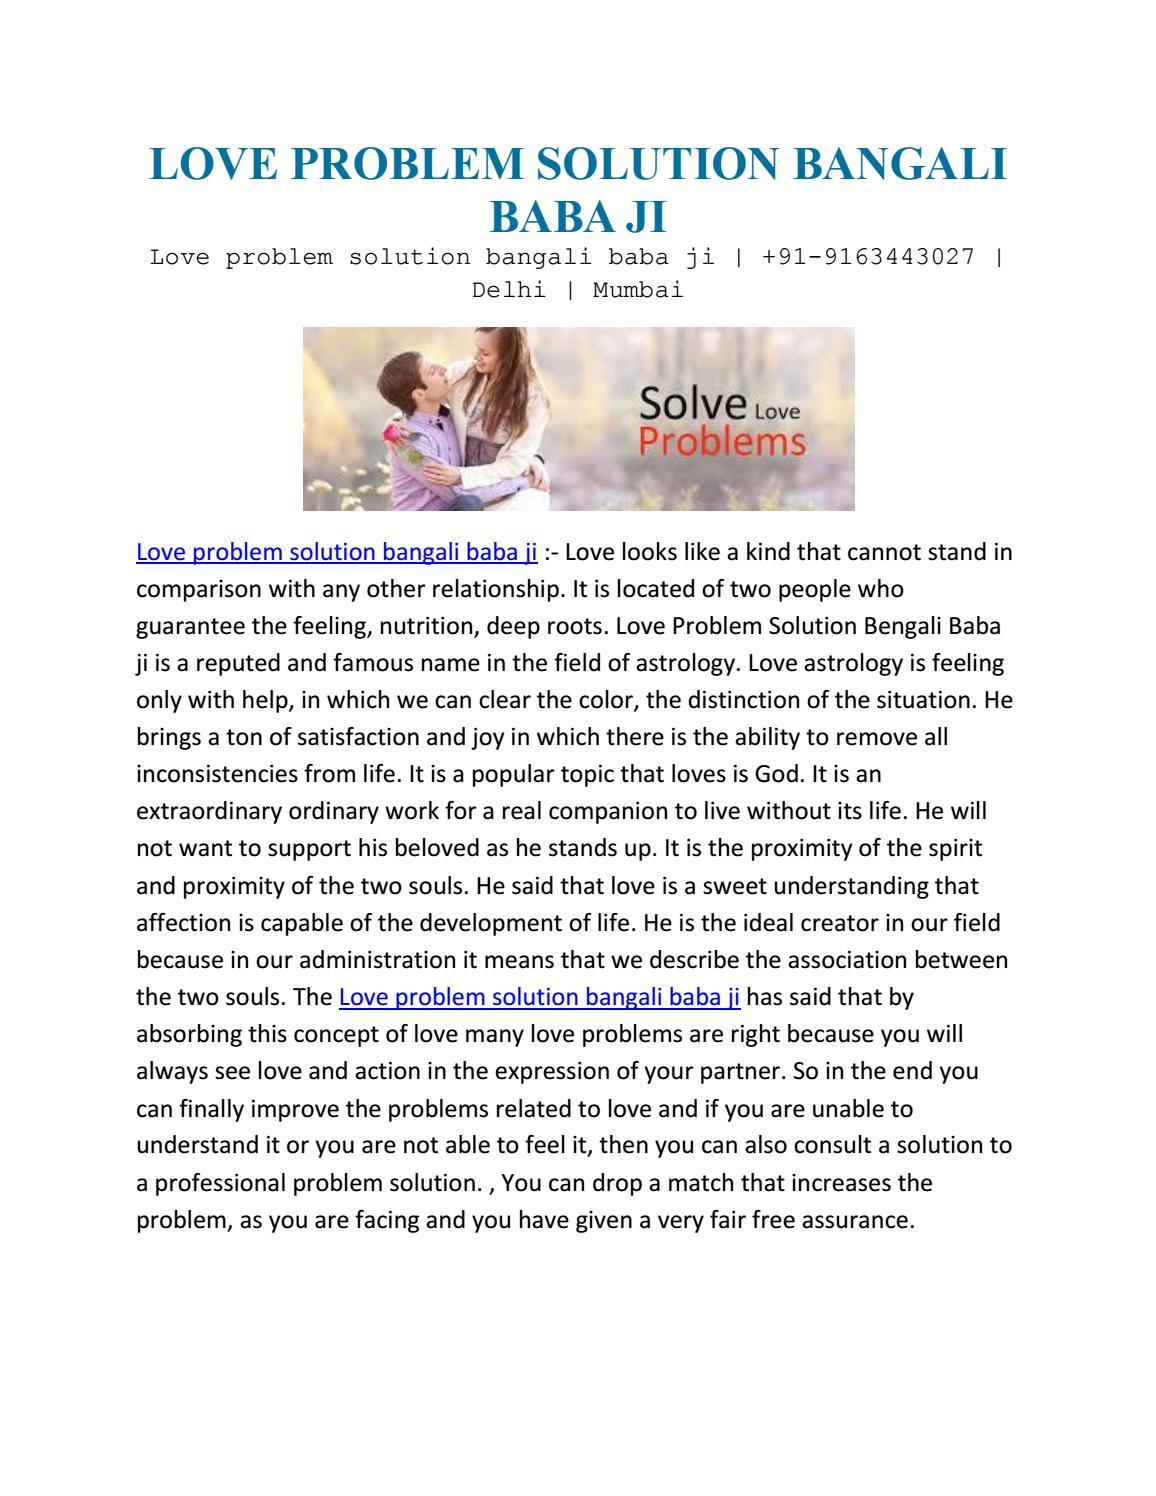 Love problem solution bangali baba ji by onlineloveproblem solution